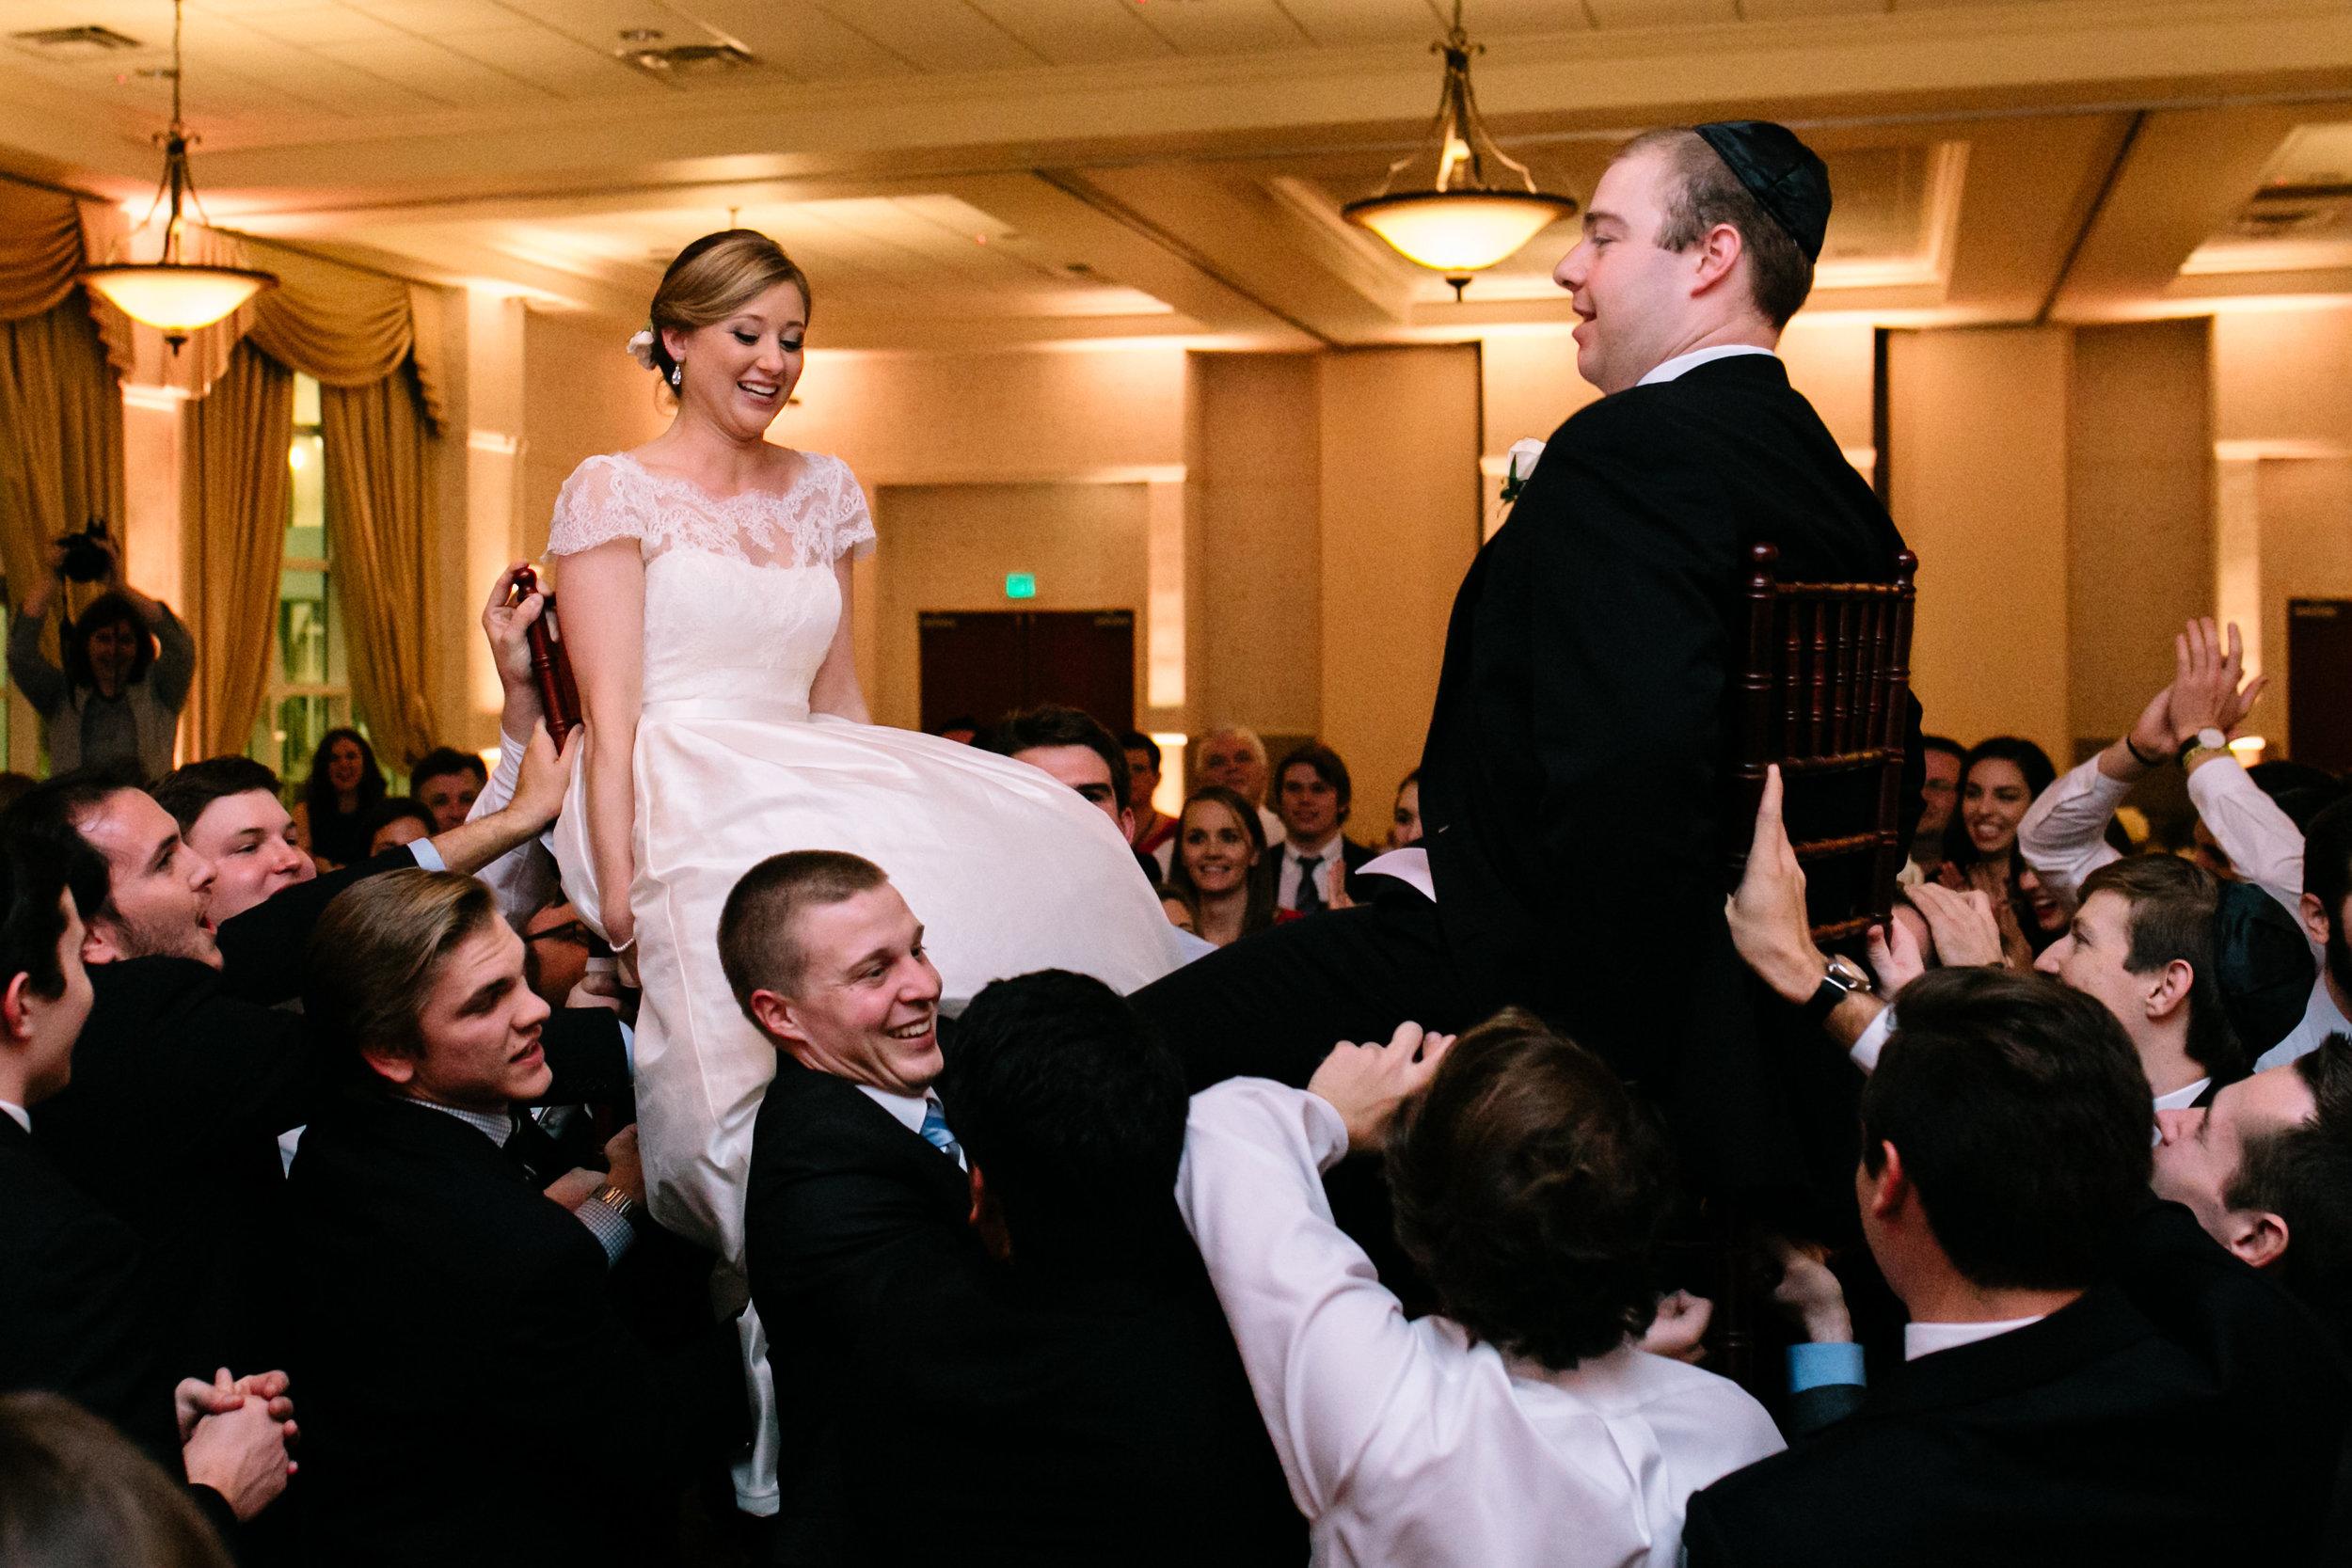 Jewish wedding reception traditions